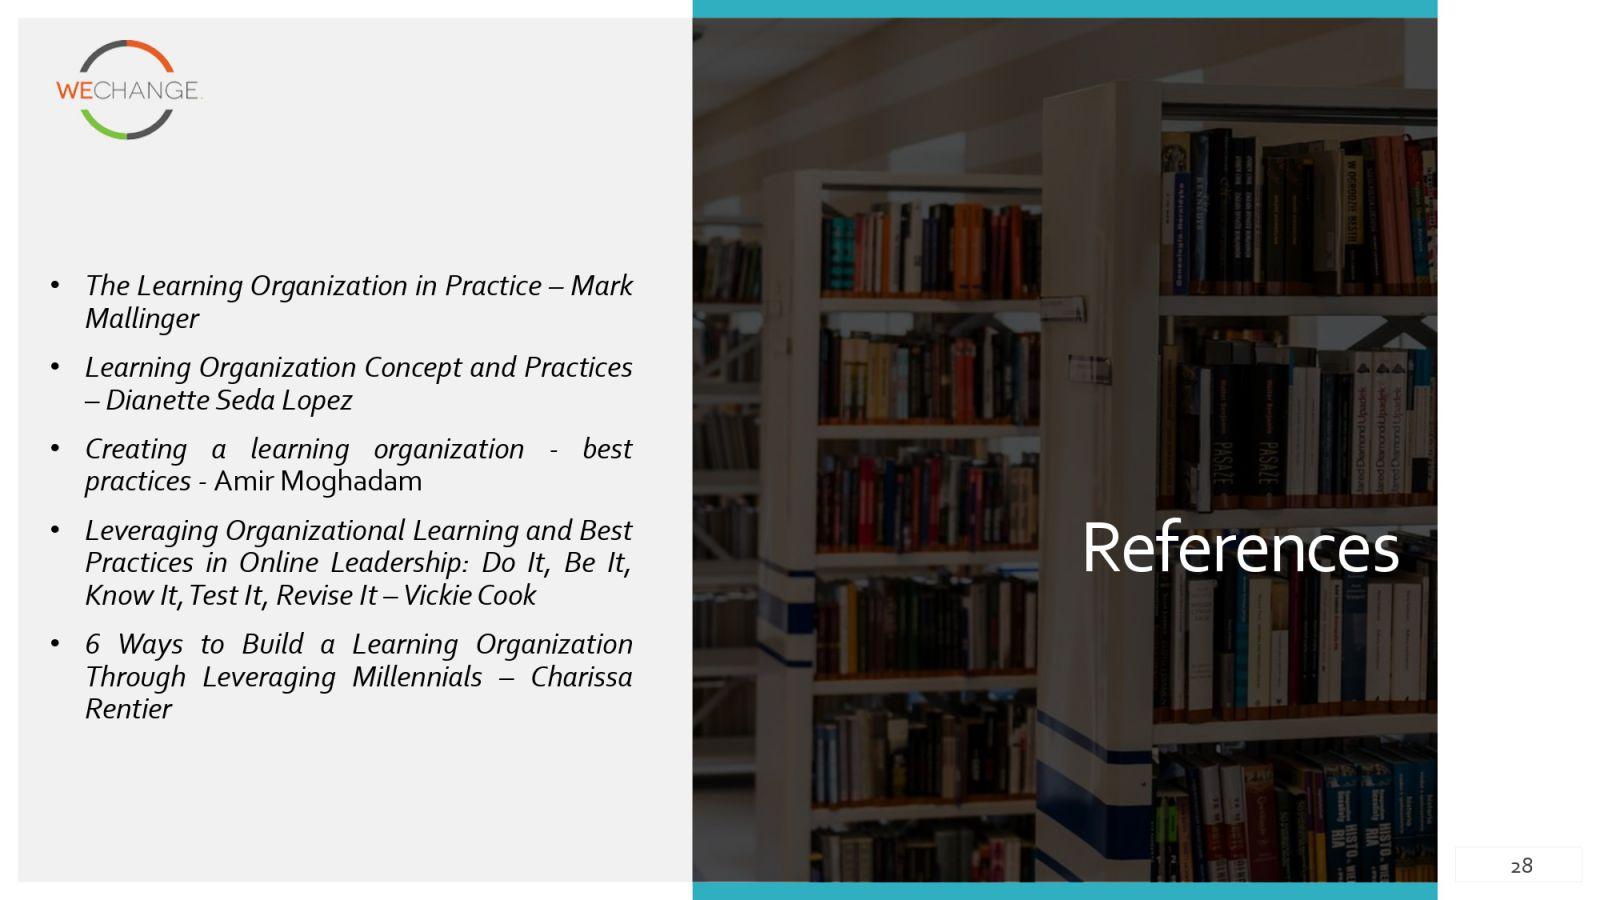 learnin organization in practice page 0015 compressed The learning organization in practice